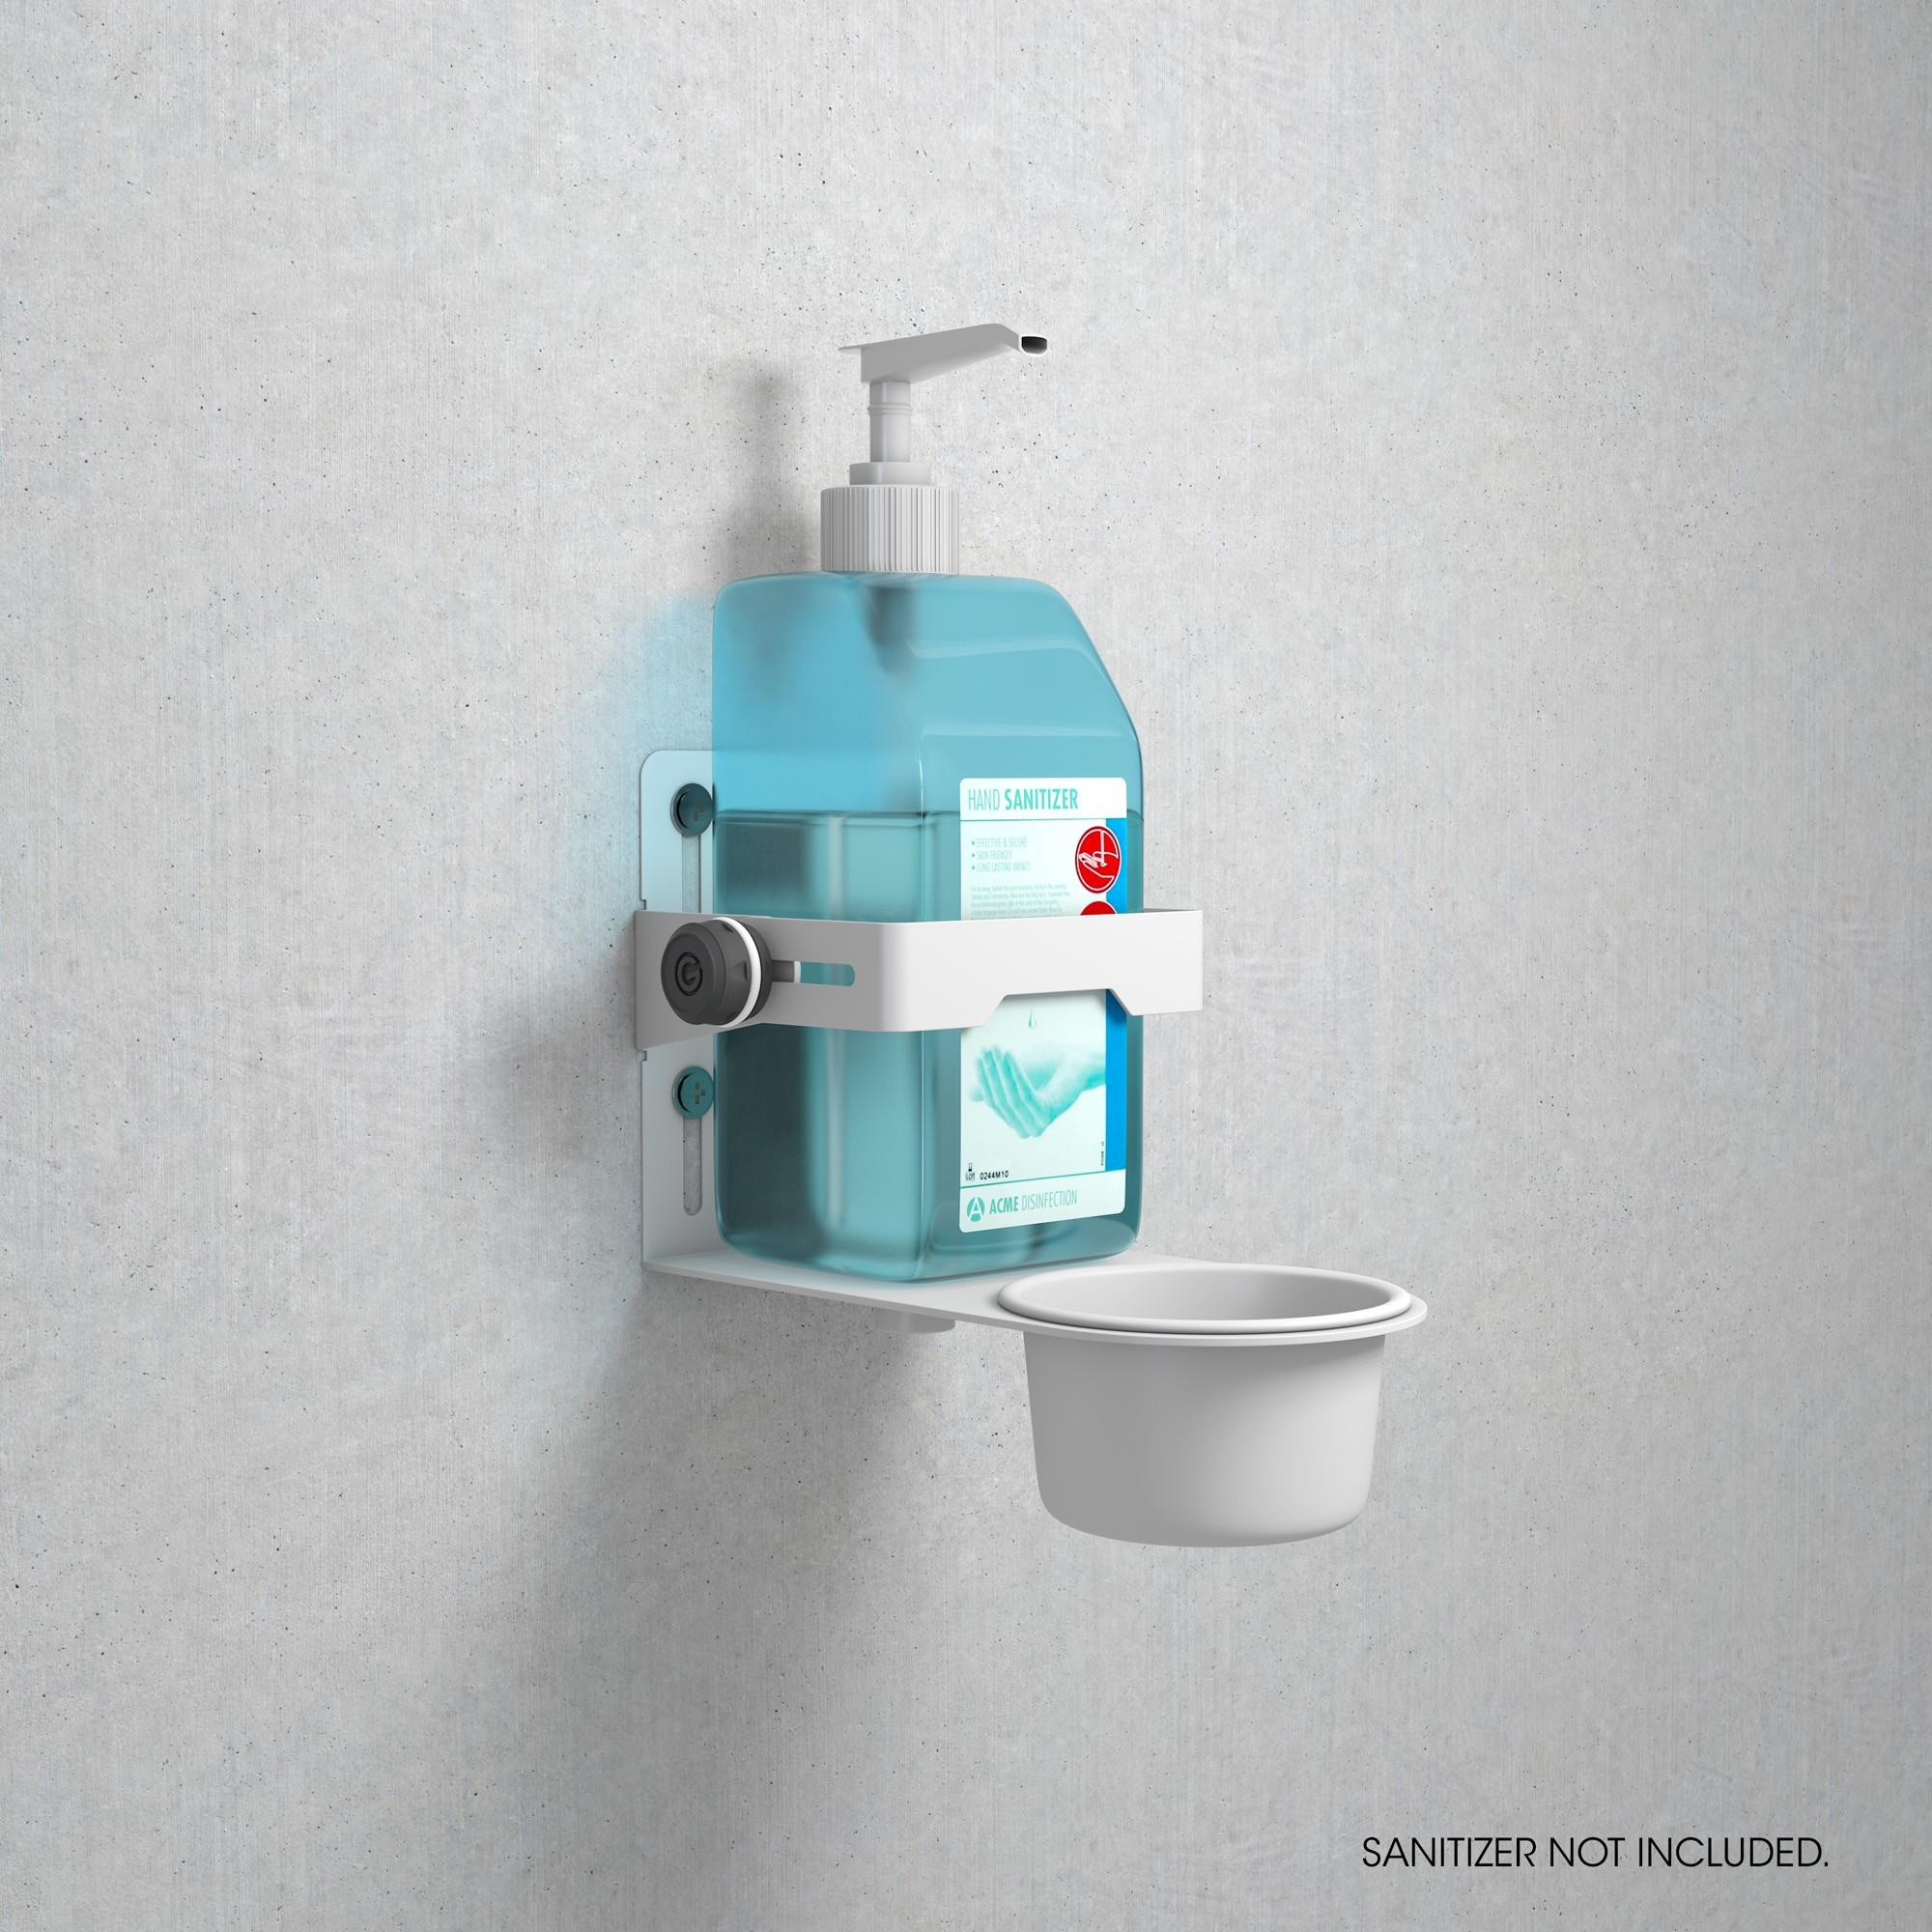 Statīvs dezinfekcijai GRAVITY MA DIS 01 W